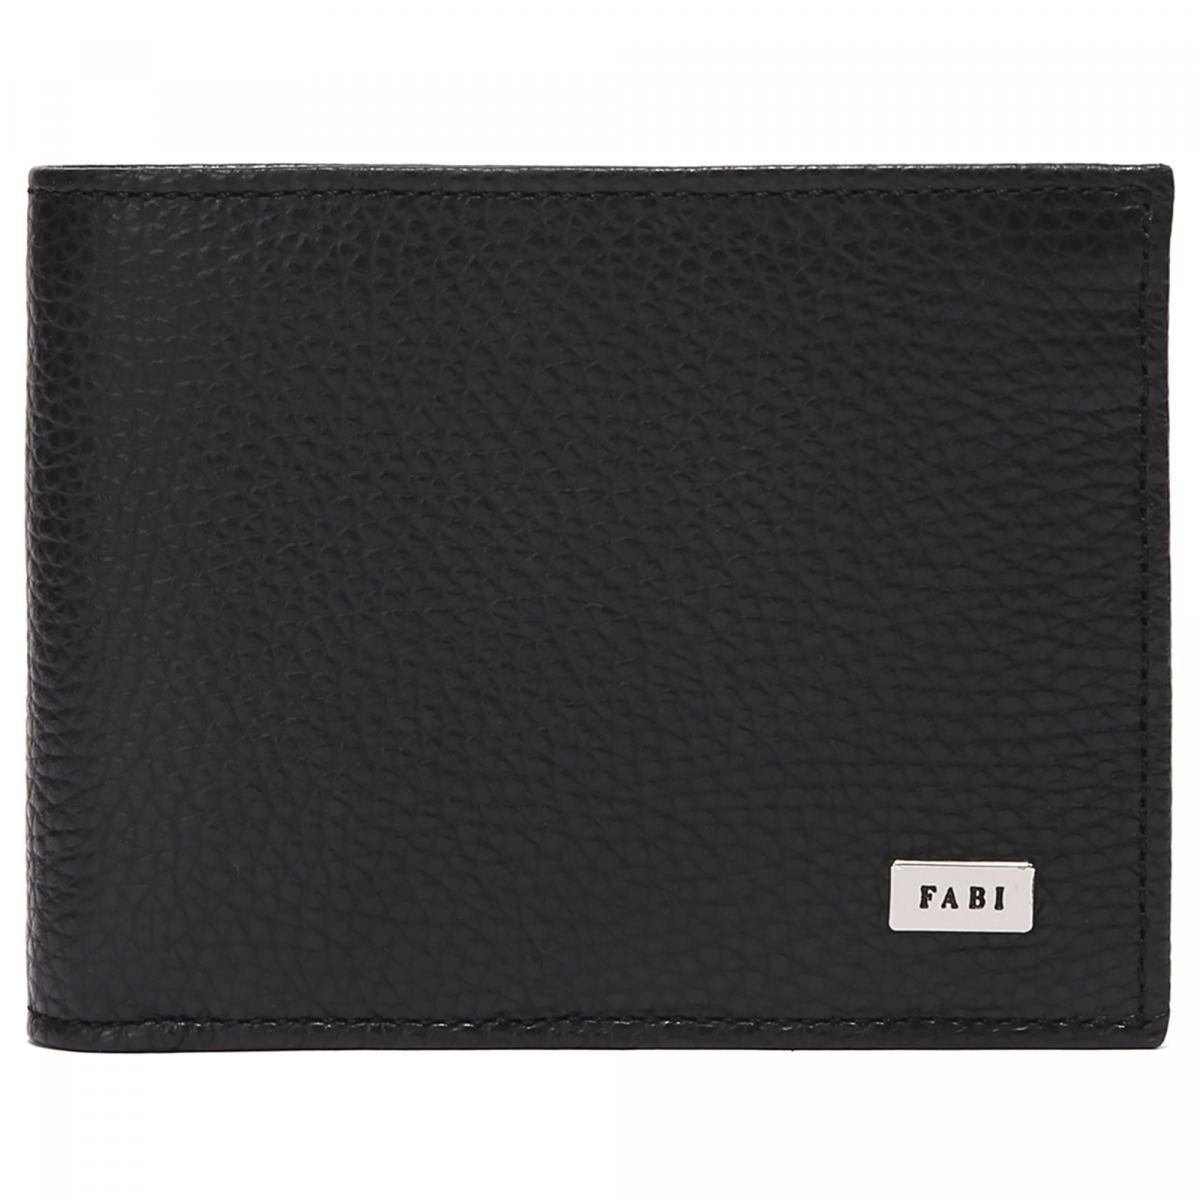 Бумажник Fabi